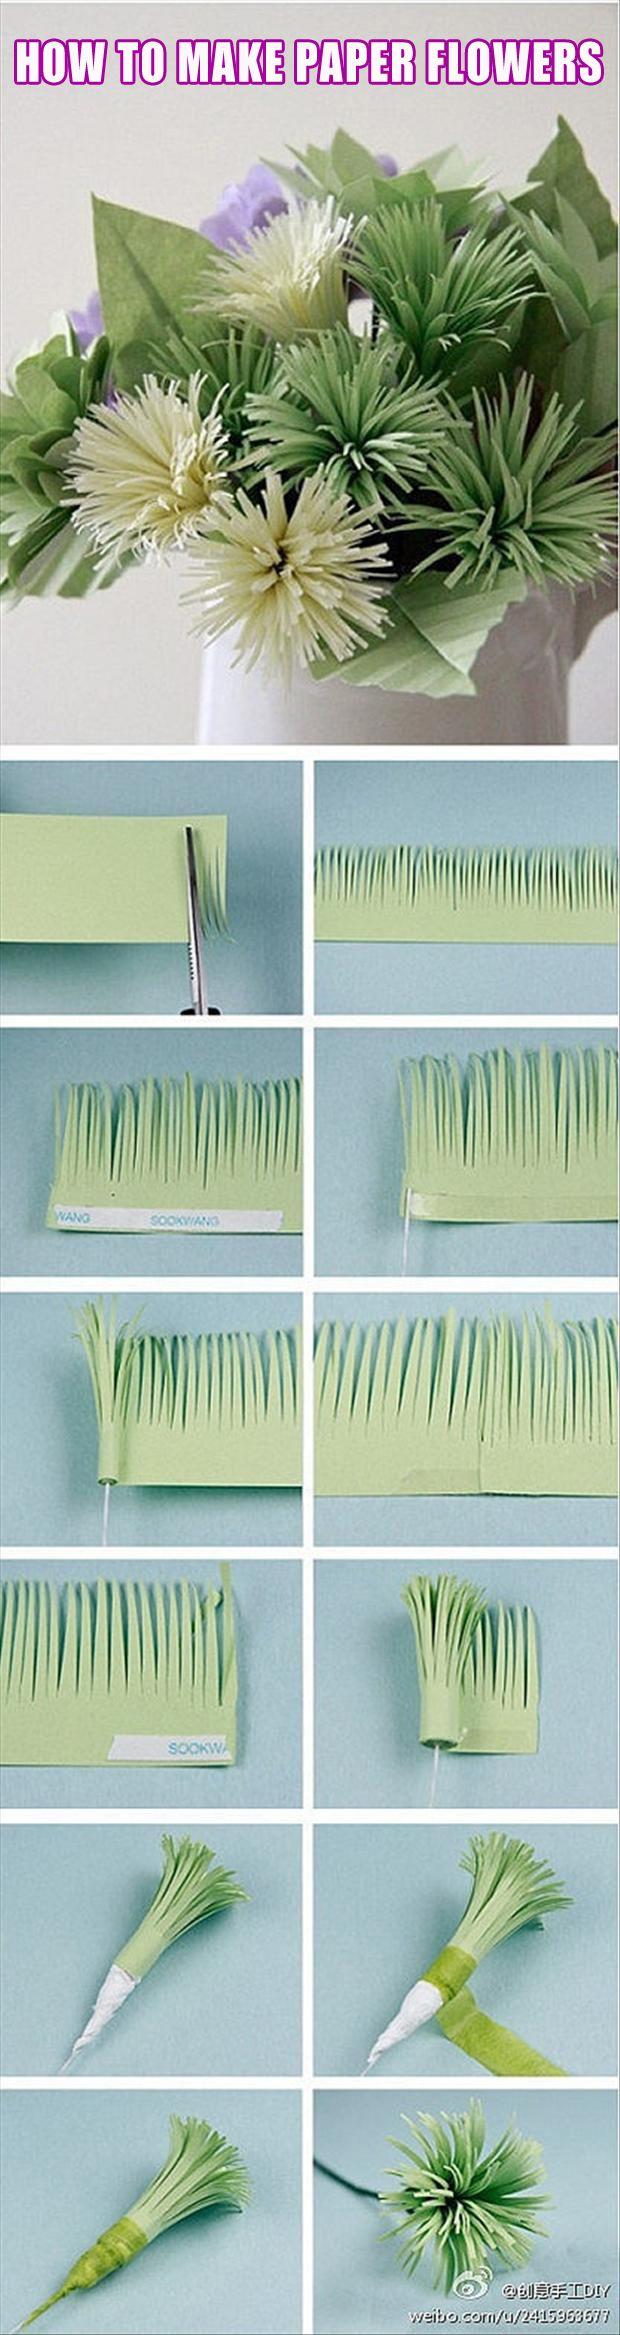 Flores de papel                                                                                                                                                     Mais